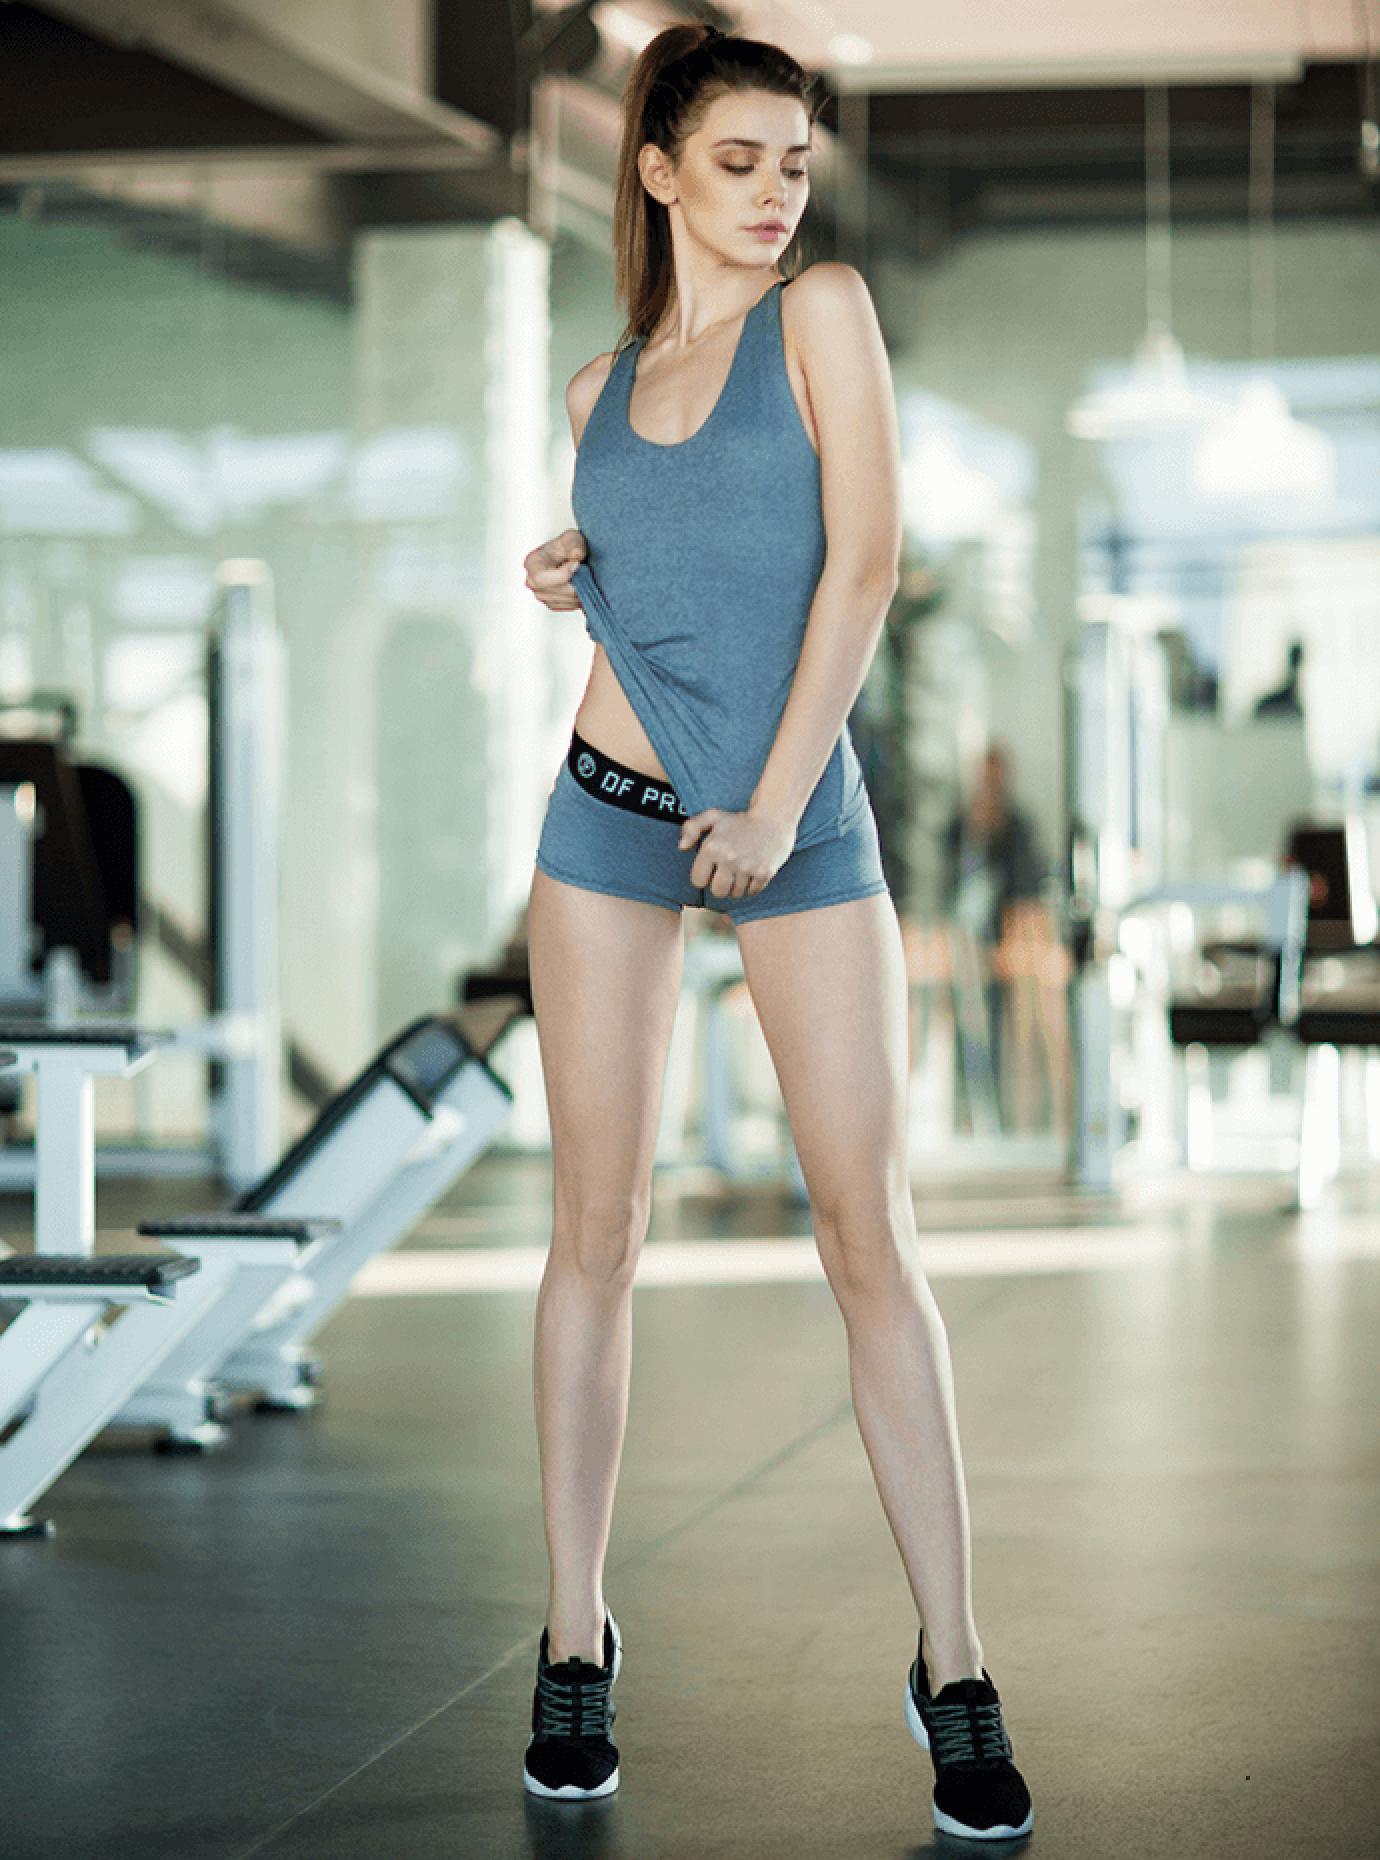 Комплект женский Fitness Grey Shorts Серый S (01-F171125): фото - Alster.ua